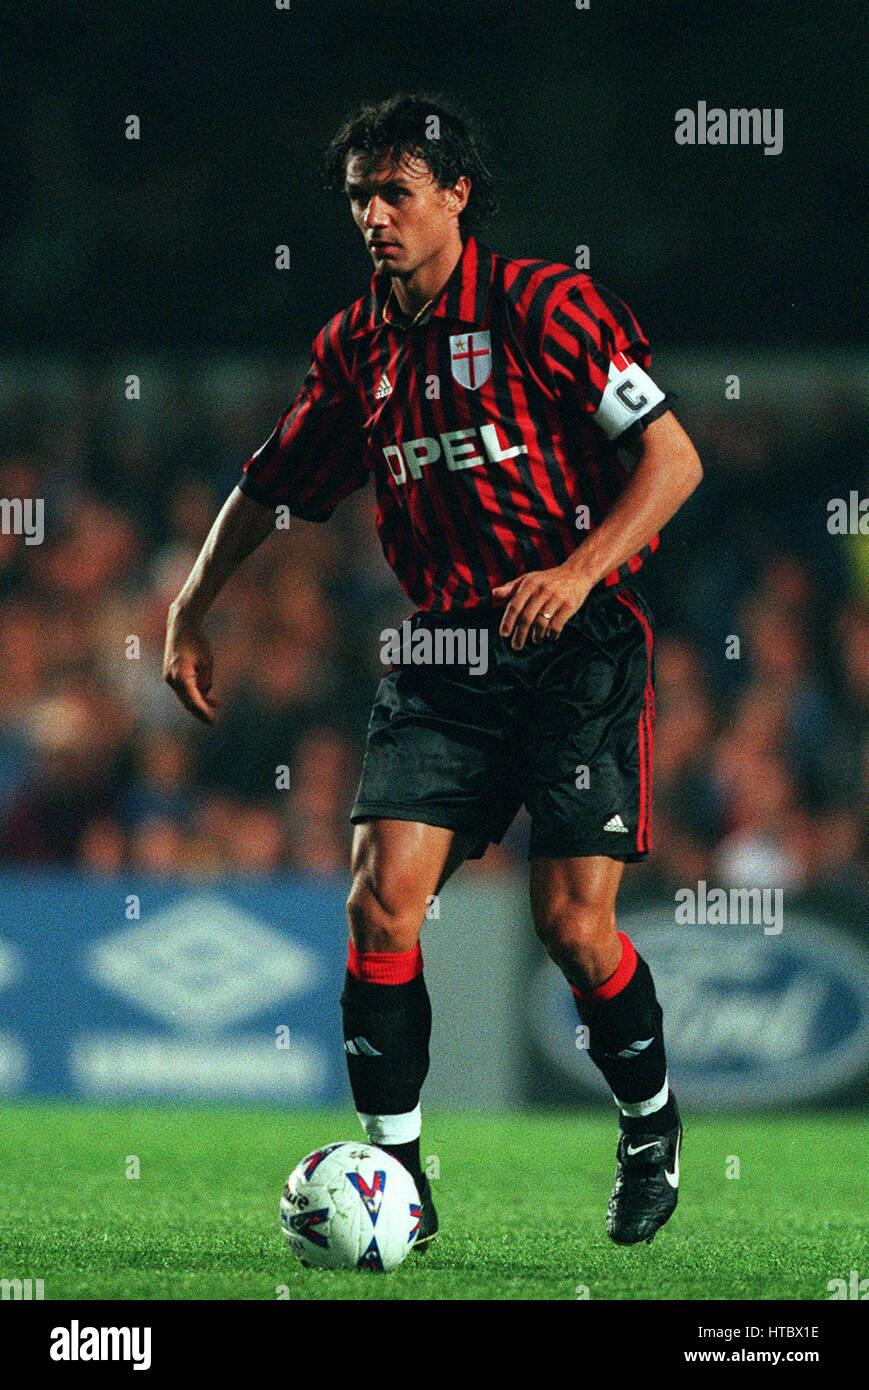 PAOLO MALDINI AC MILAN 19 September 1999 Stock Royalty Free